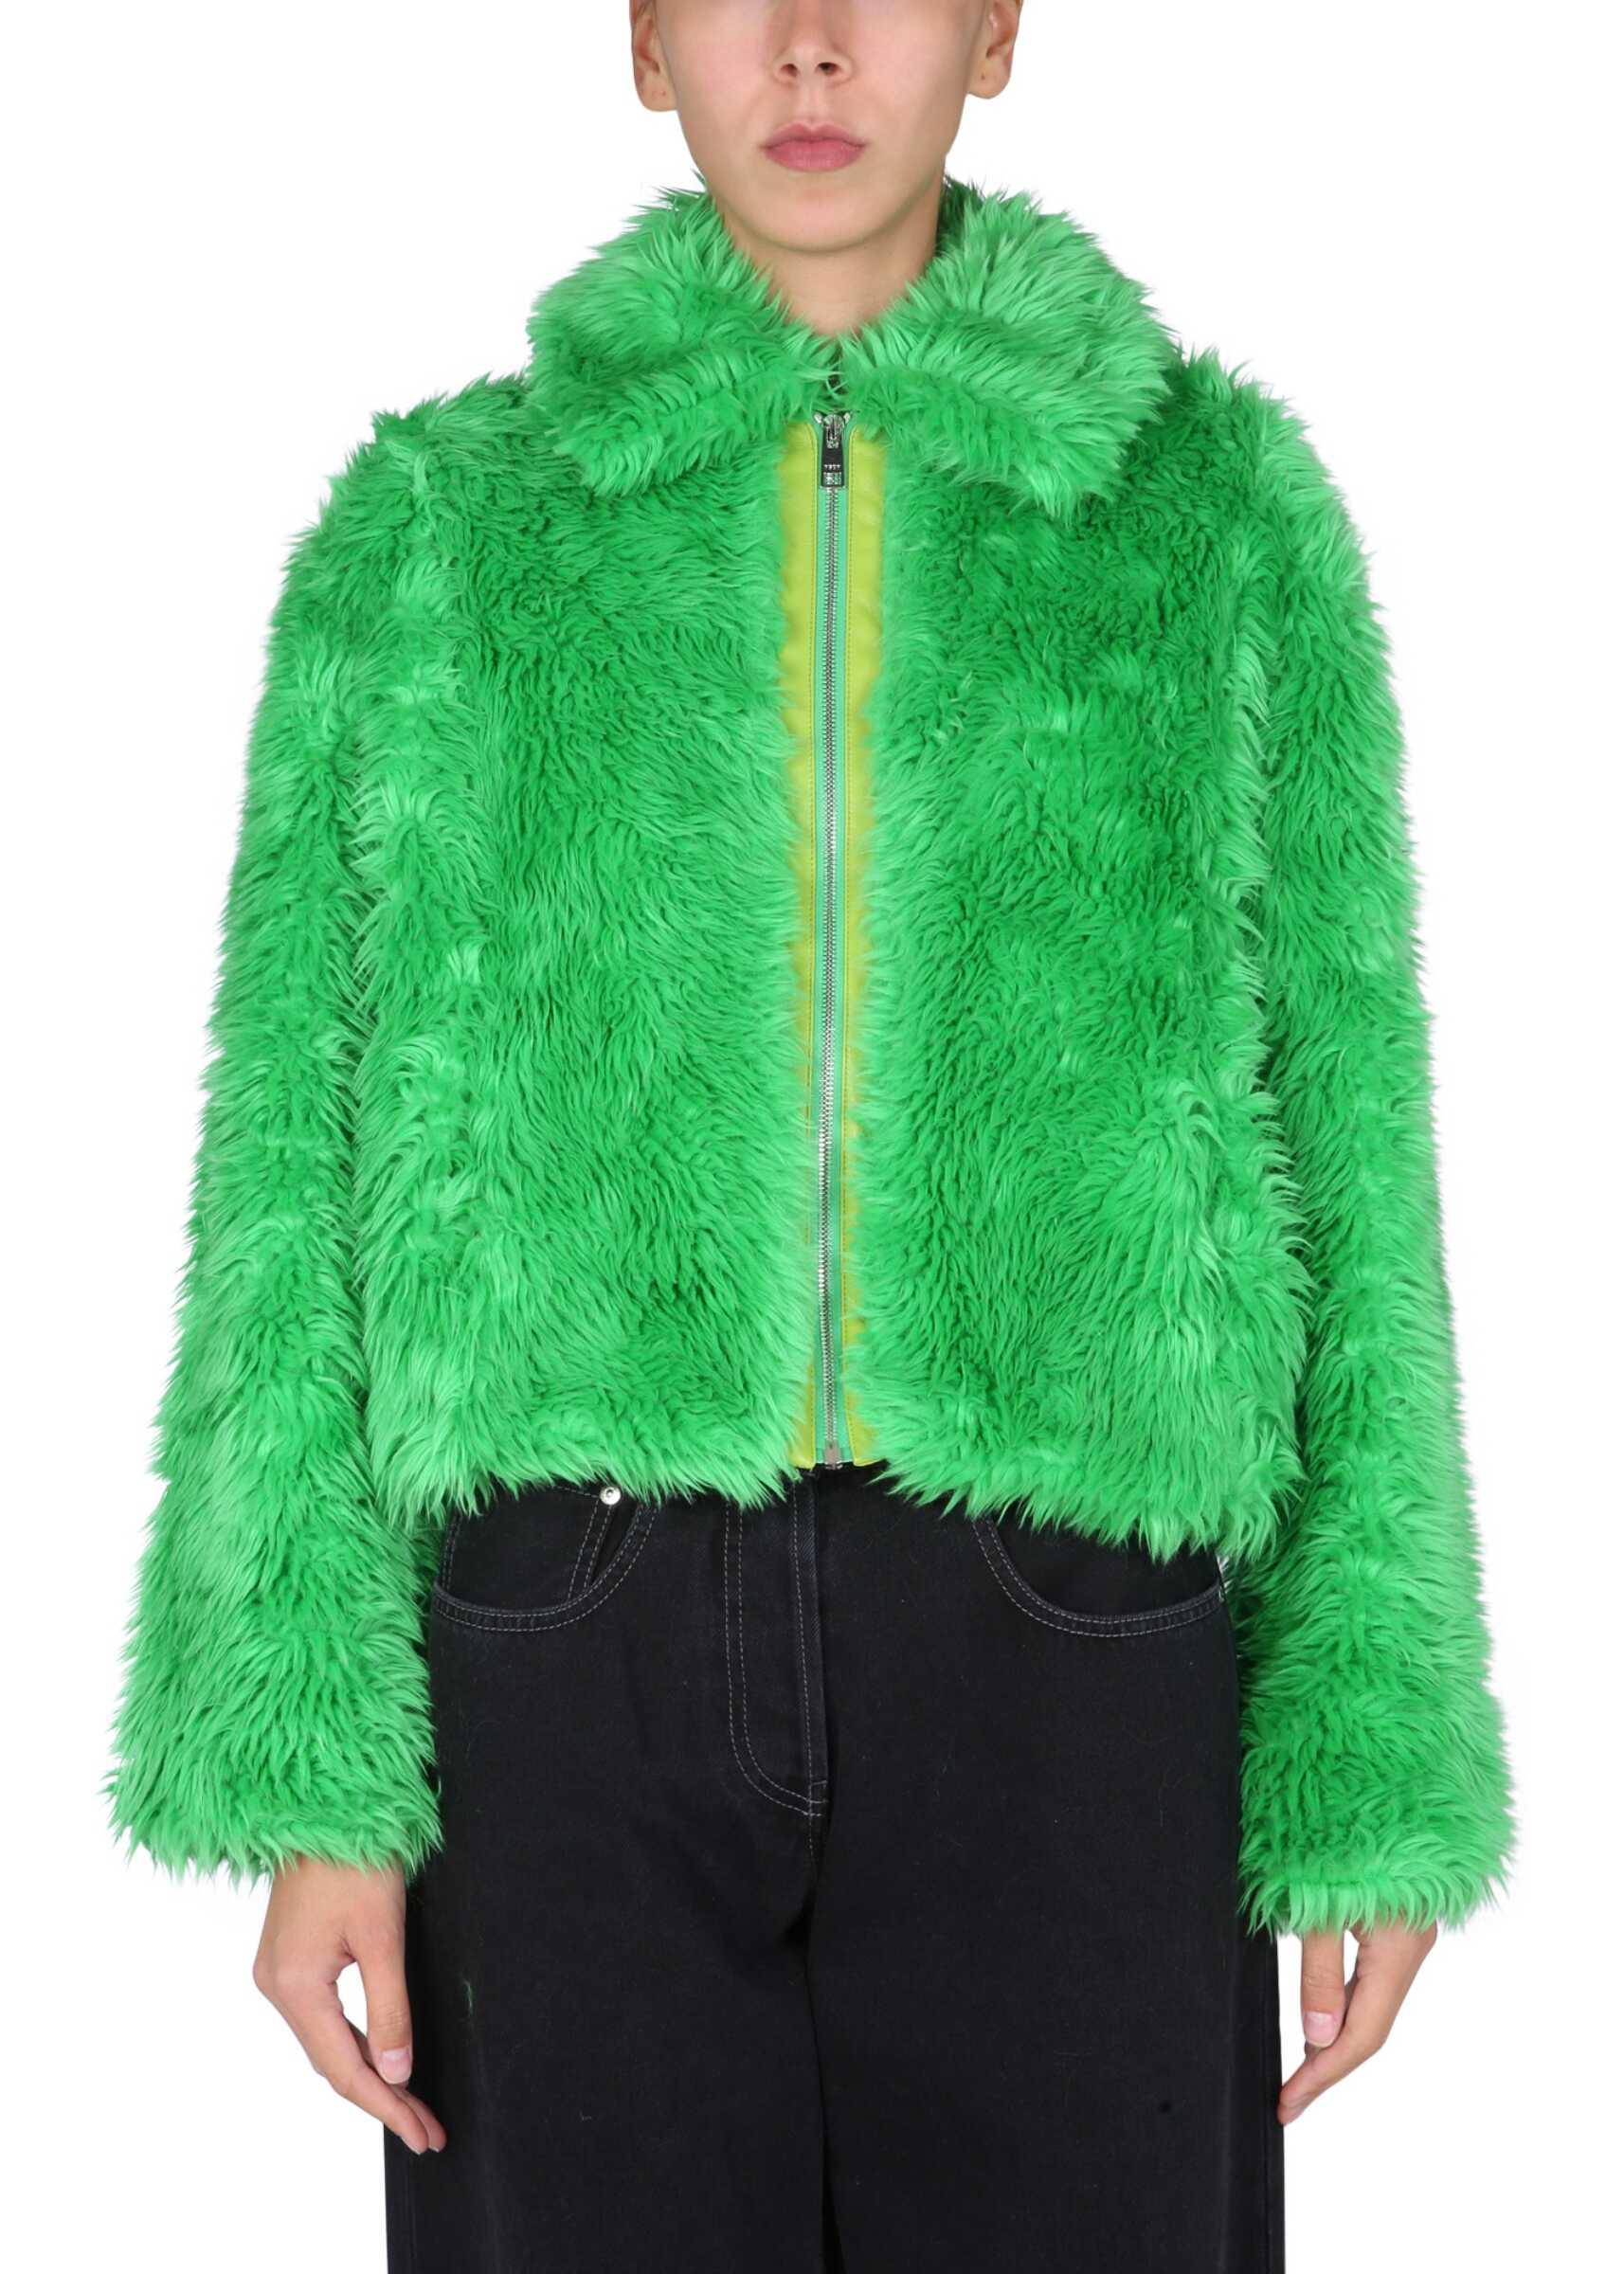 MSGM Faux Fur Jacket 3142MDH101_21780536 GREEN image0